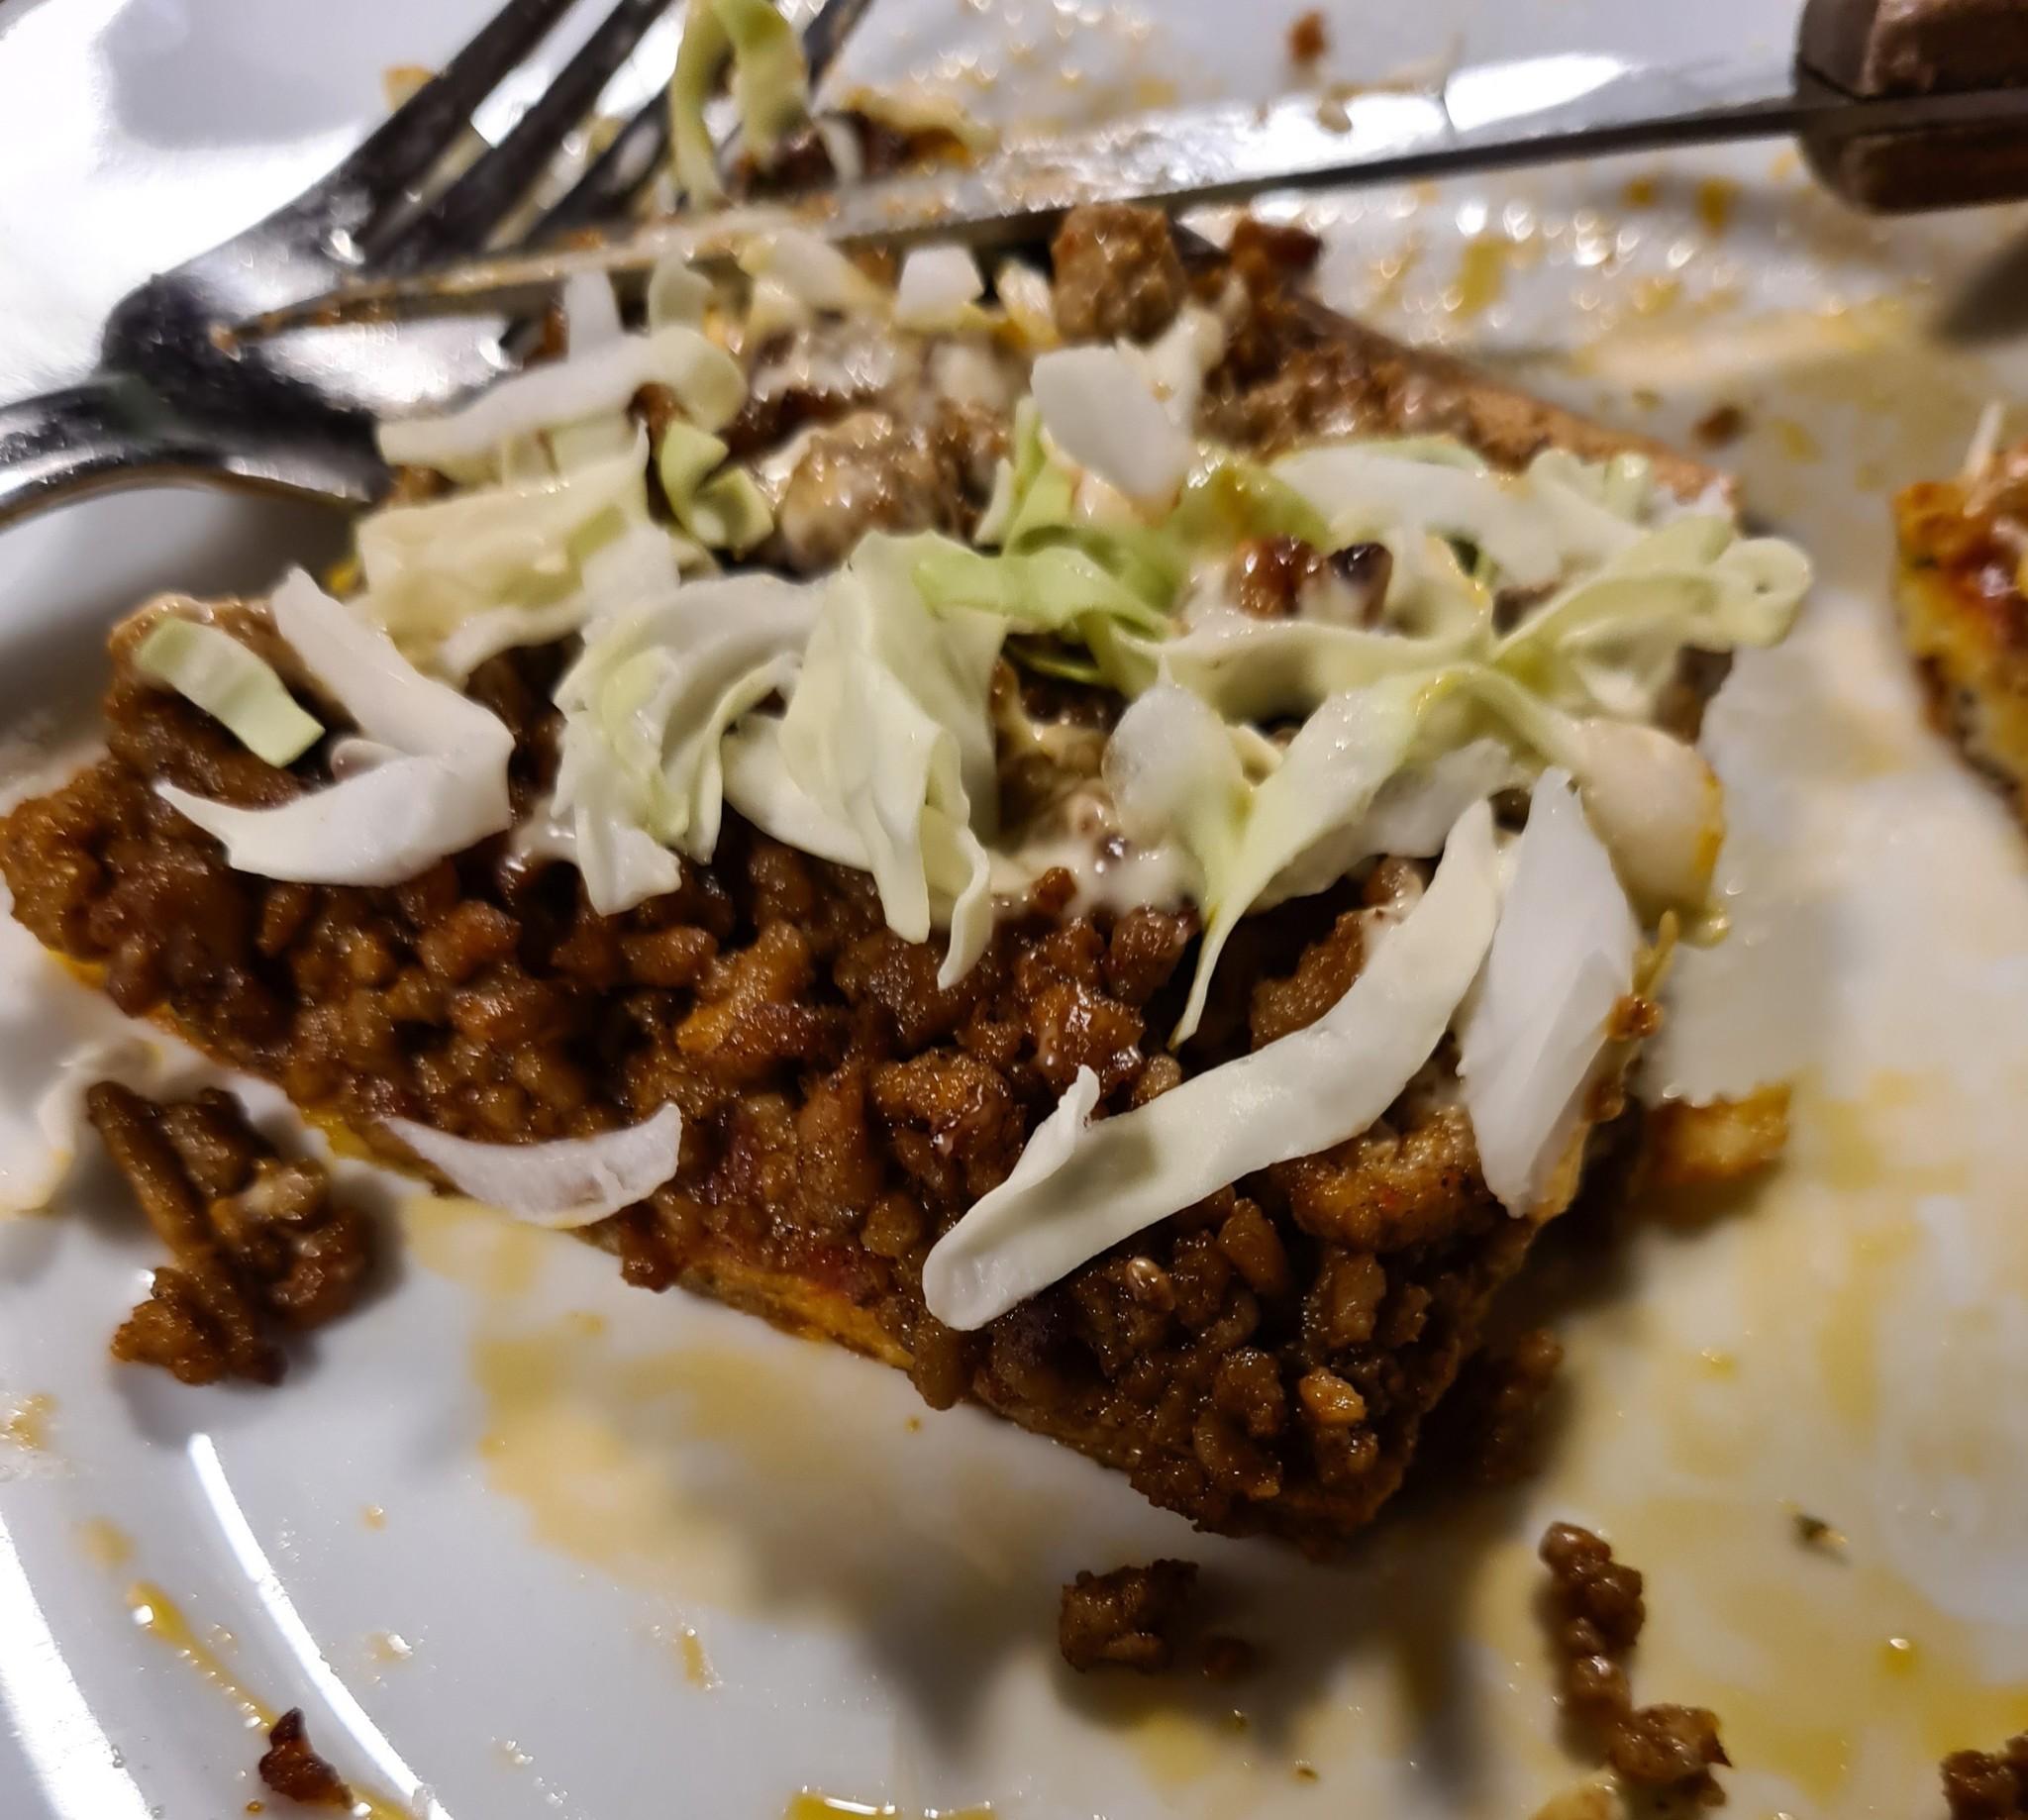 Fathead Pizza Taco-KHA met eigen gemaakte kruiden